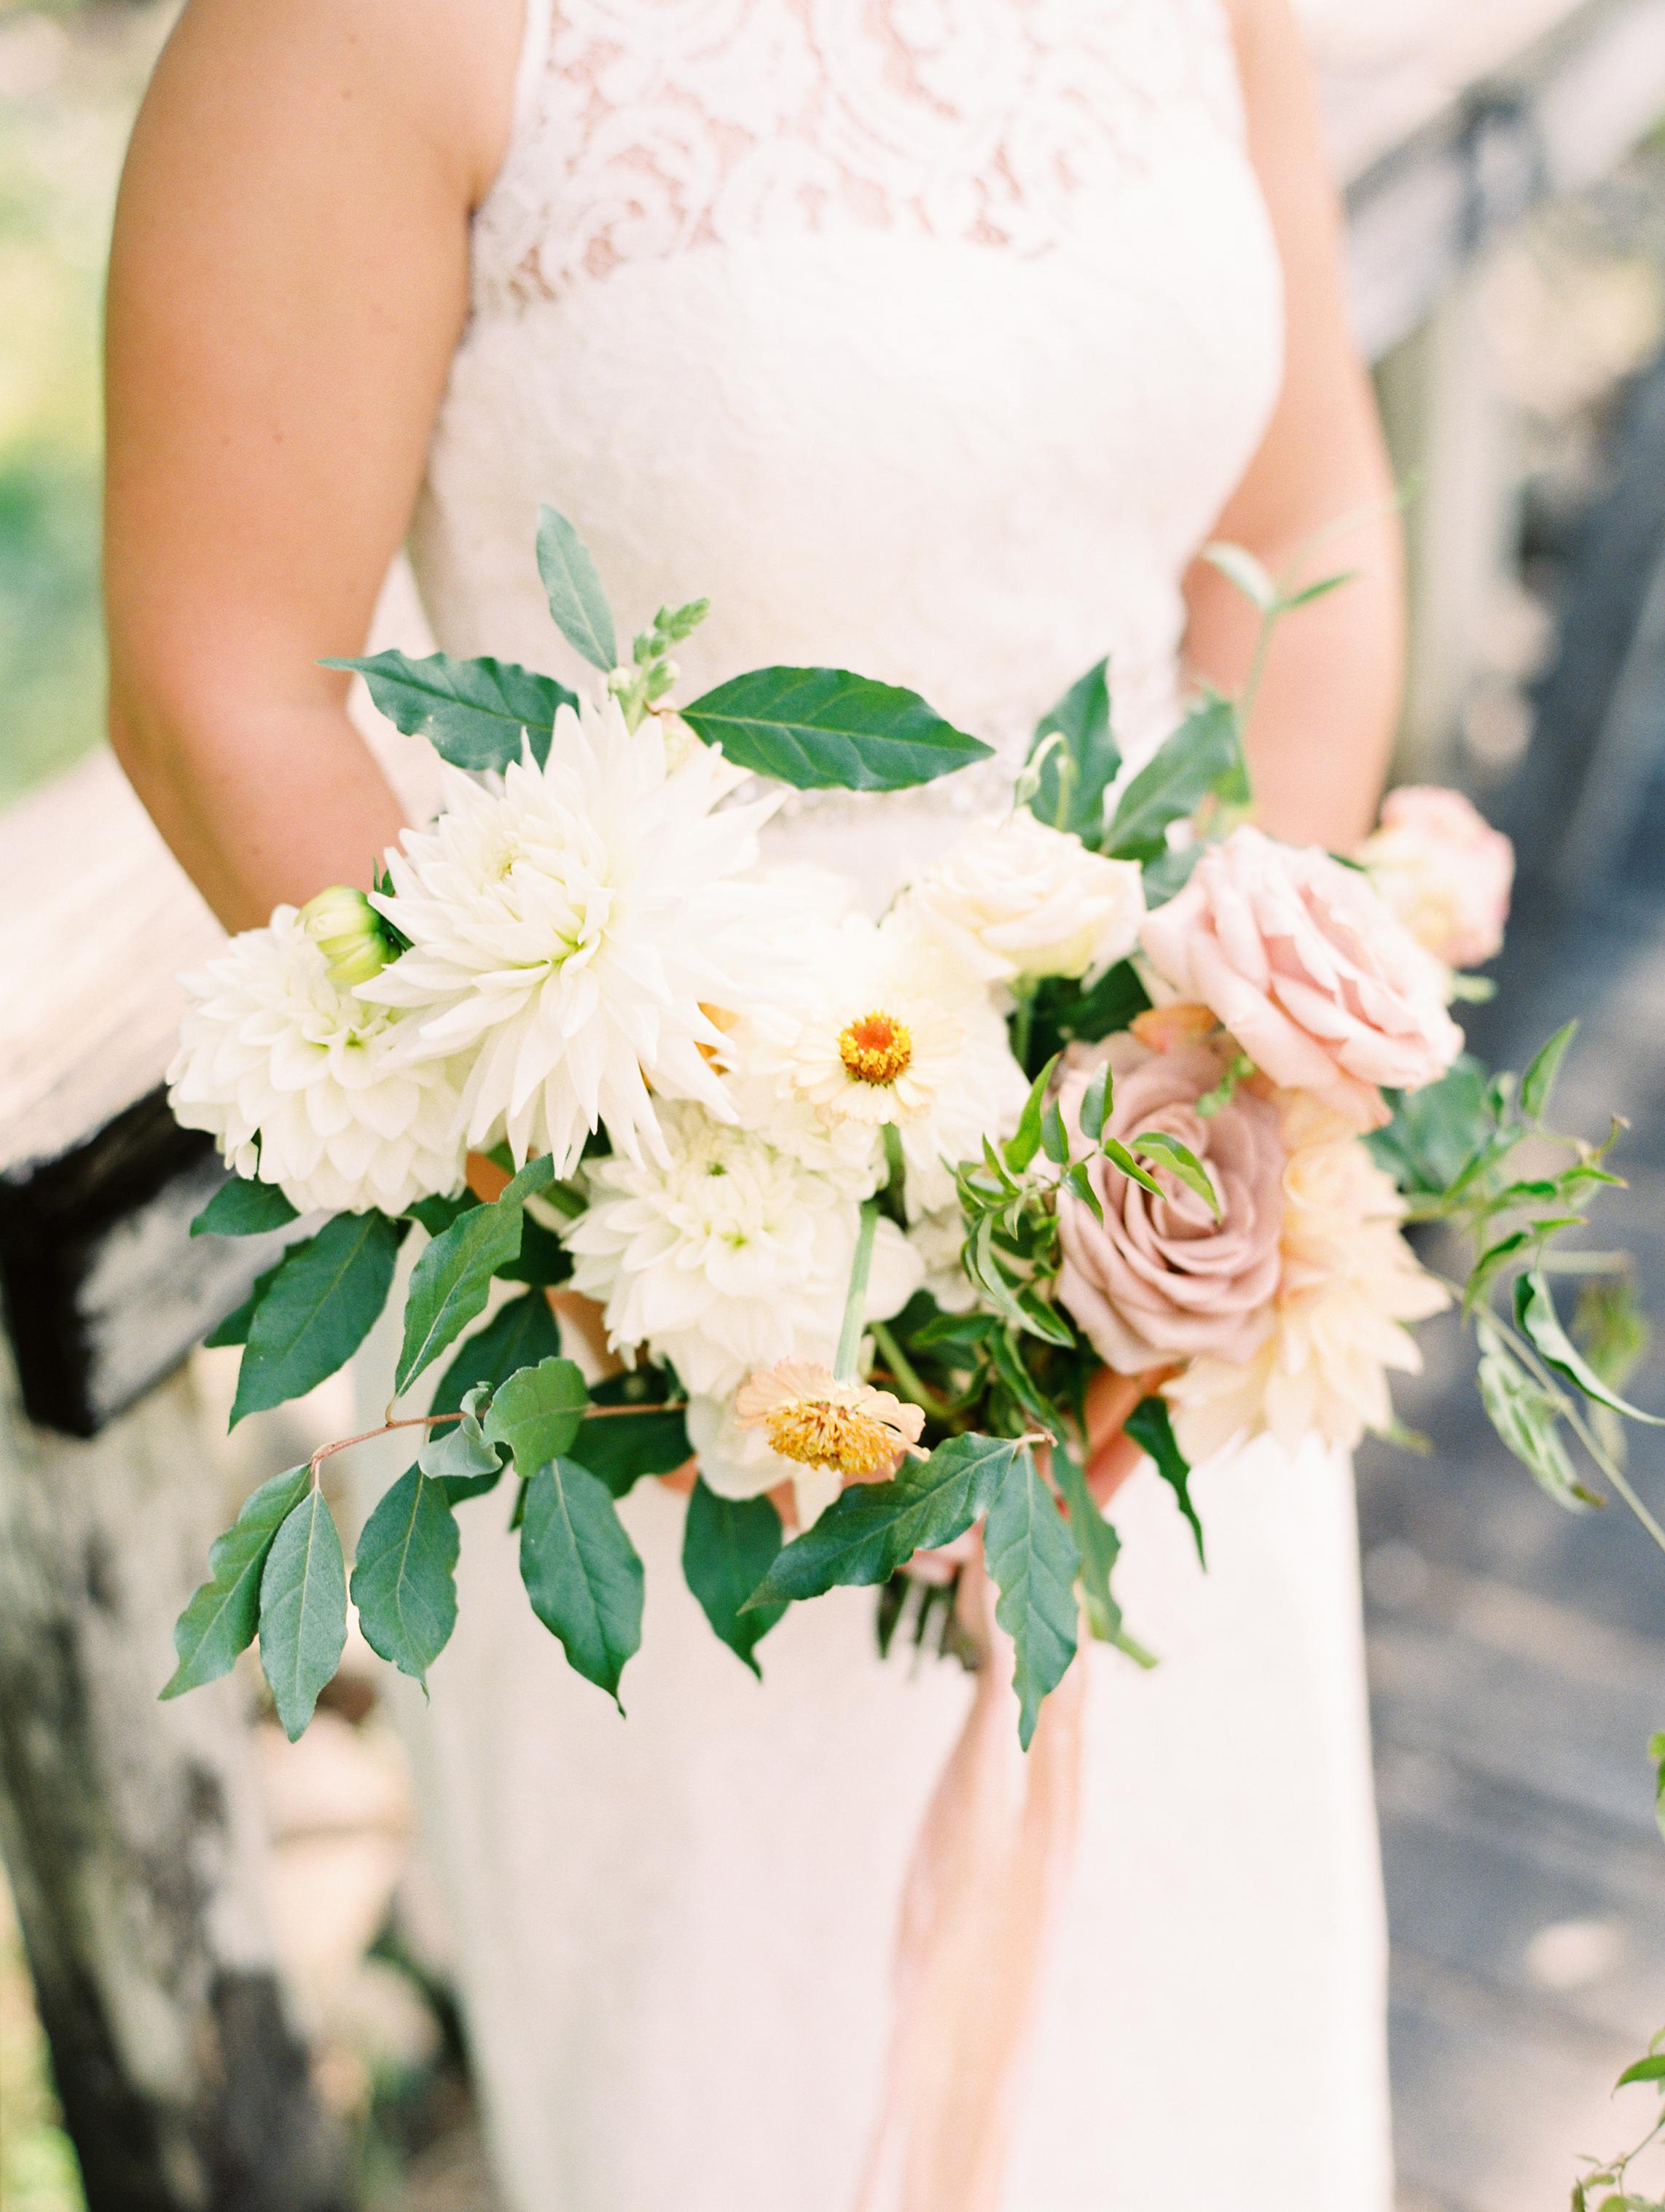 Zoller+Wedding+Bridal+Partyf-35.jpg